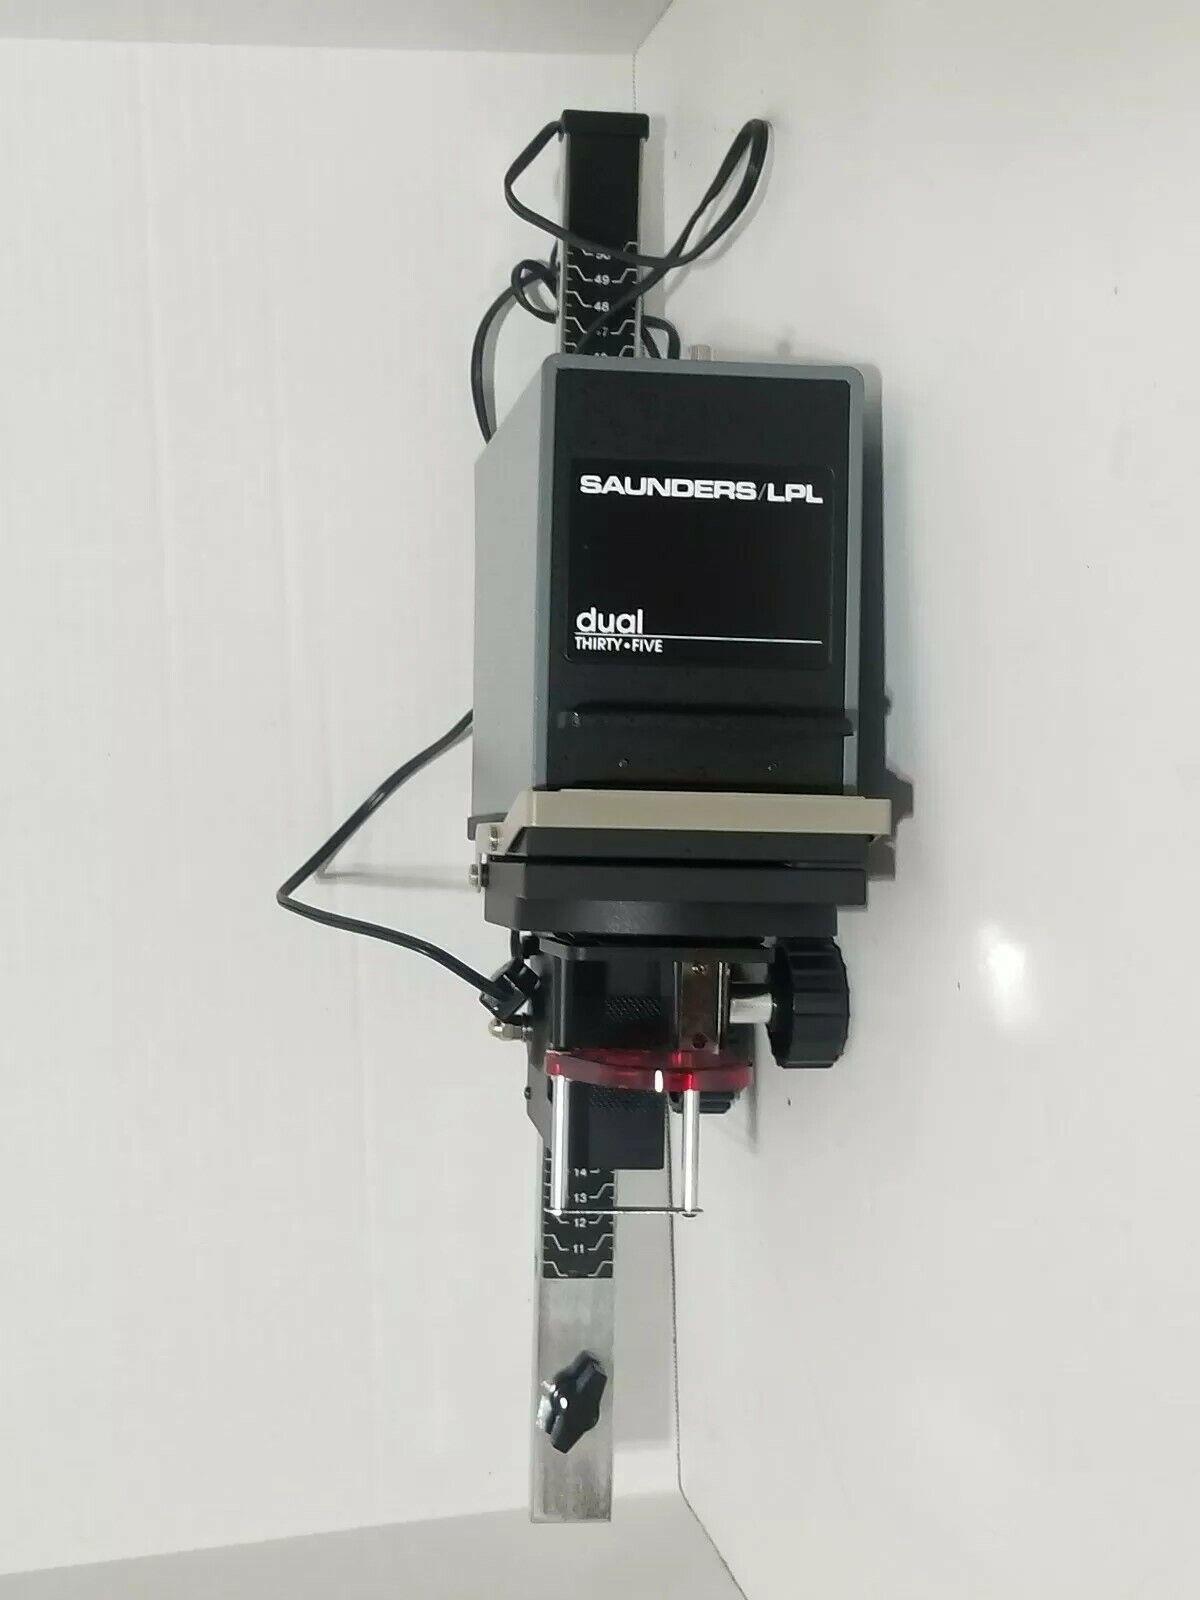 Saunders Lpl 670 Copy Camera Adapter